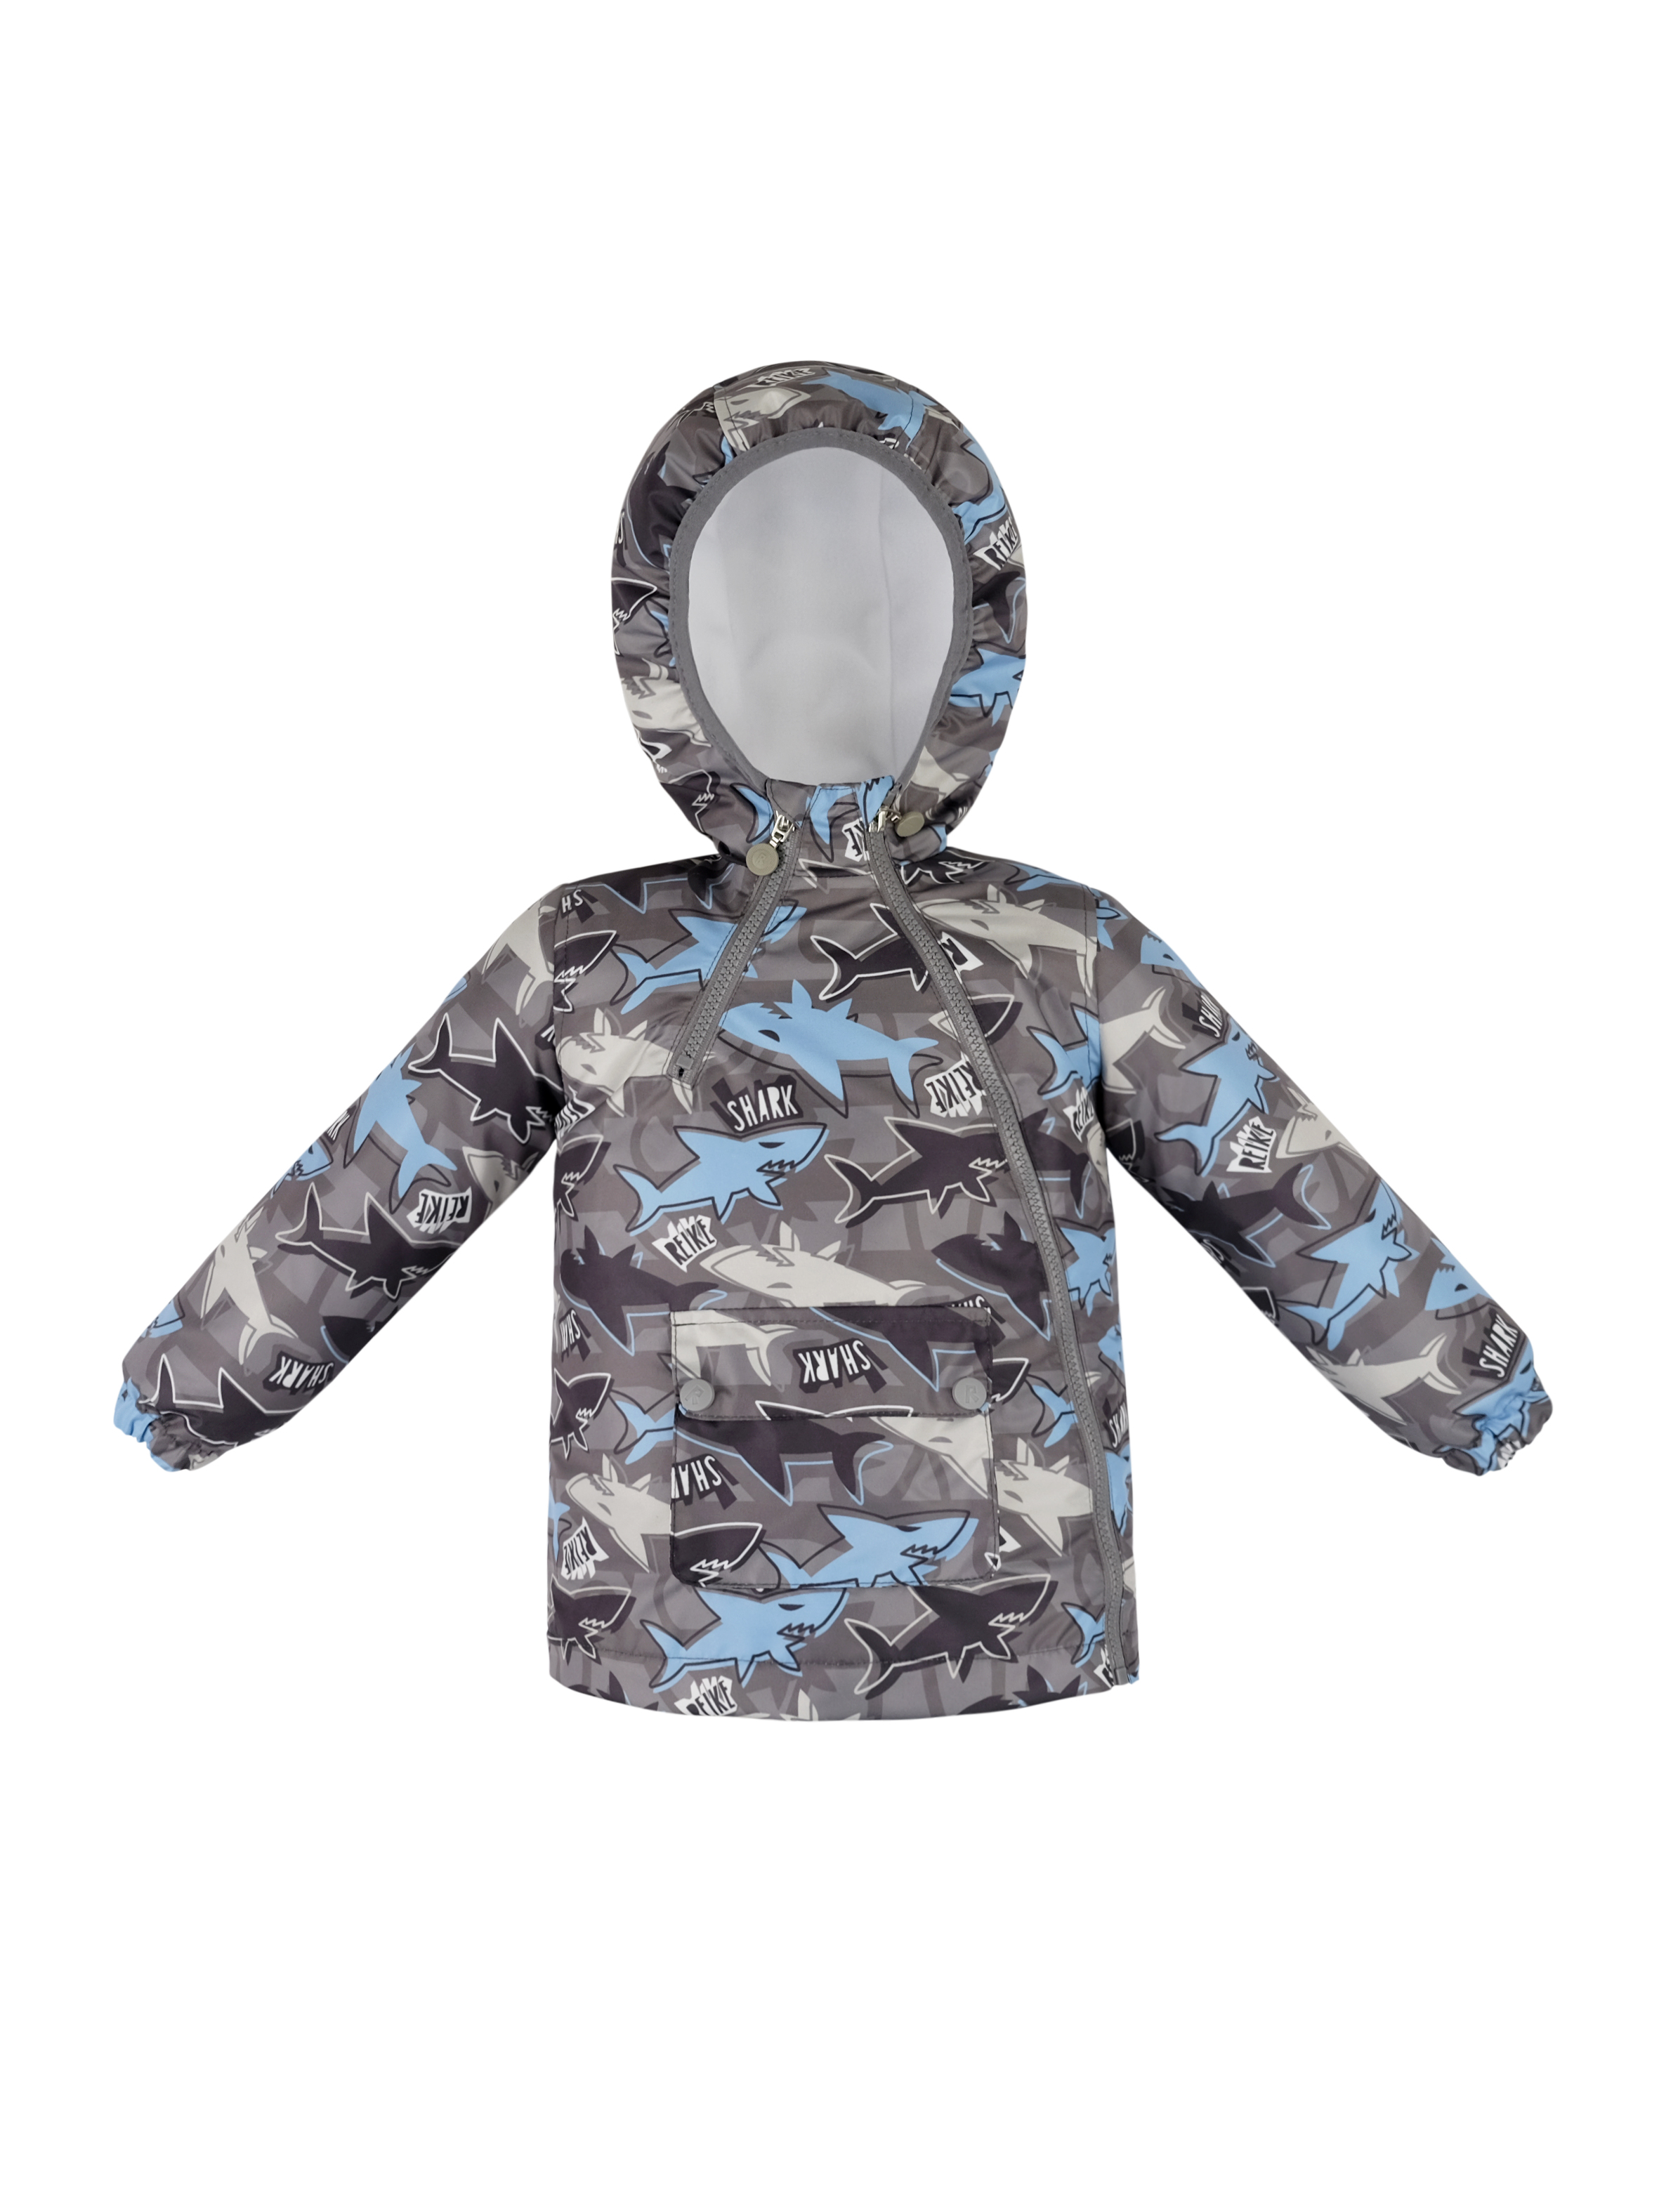 Куртка детская Reike Small sharks grey р.80